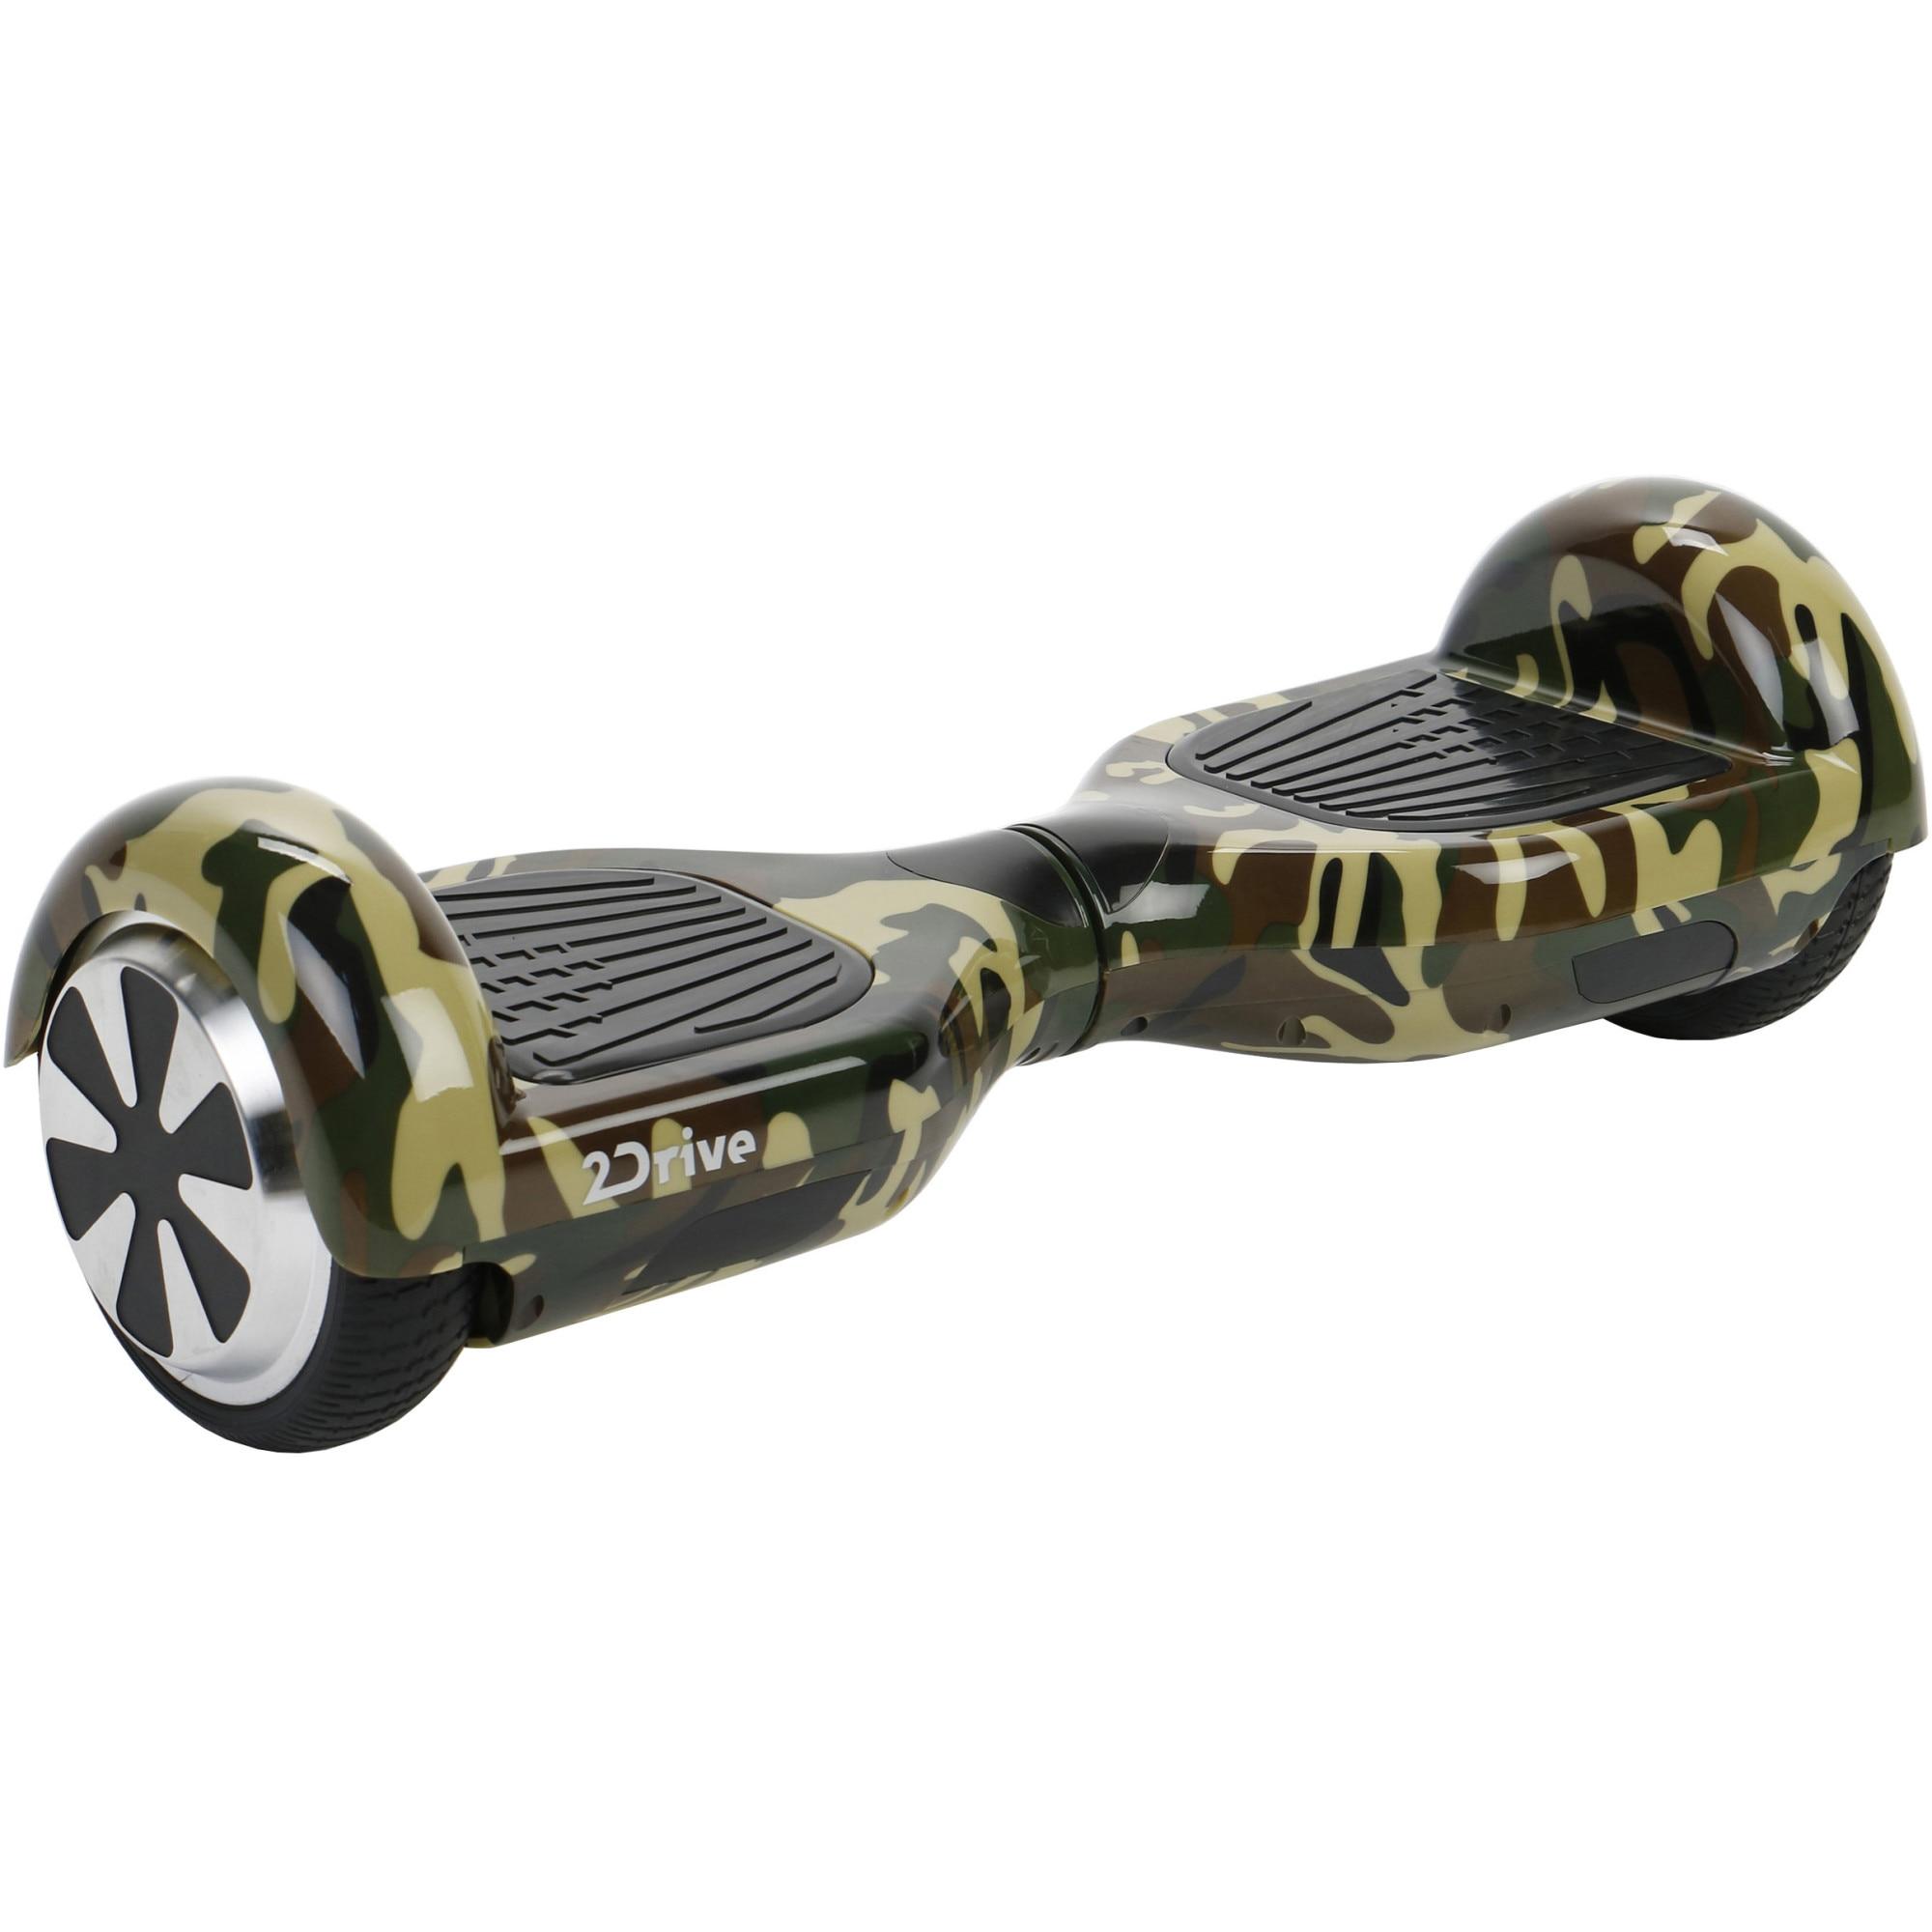 "Fotografie Scooter electric 2Drive, roti 6.5"", autonomie 15 km, viteza 10 km/h, putere motoare 500W (2 x 250), Bluetooth, difuzoare, geanta transport inclusa, Grafitti camouflage"